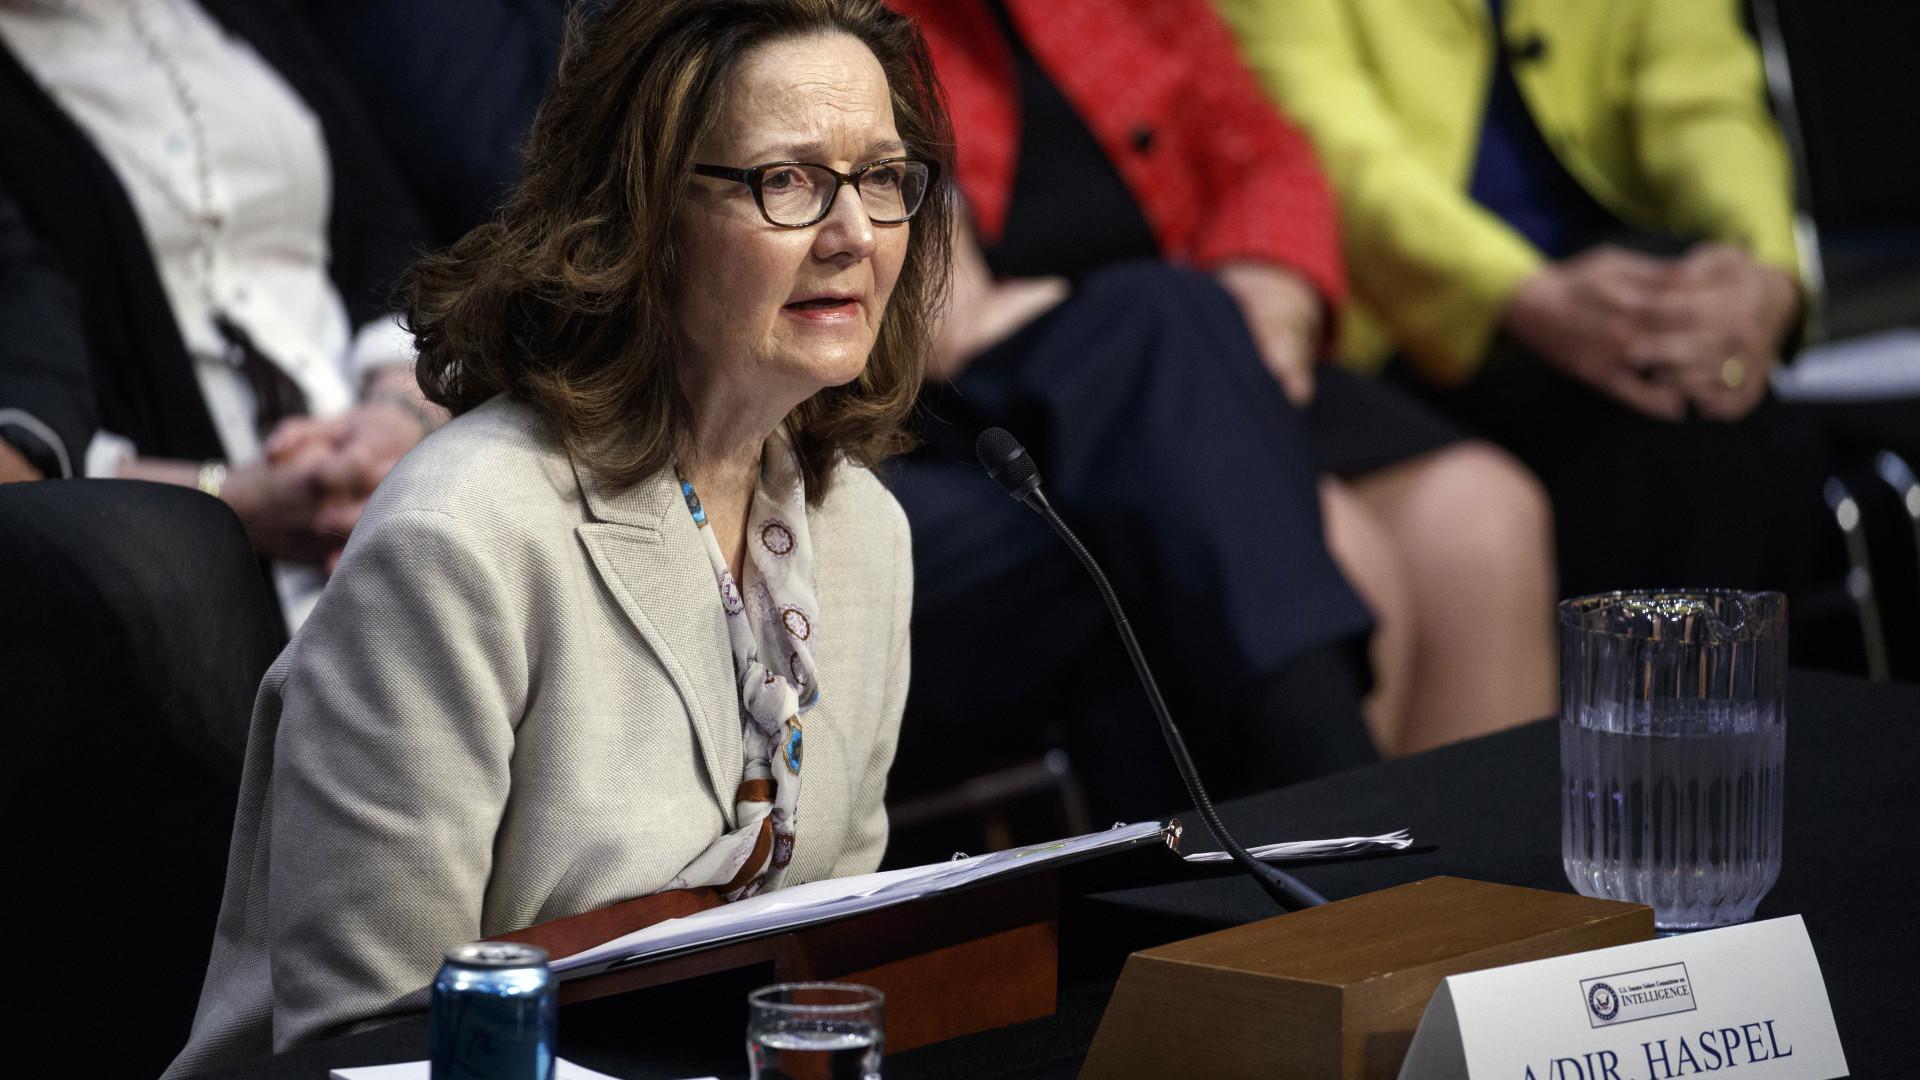 Trump defende Gina Haspel, indicada para comandar CIA, após denúncias